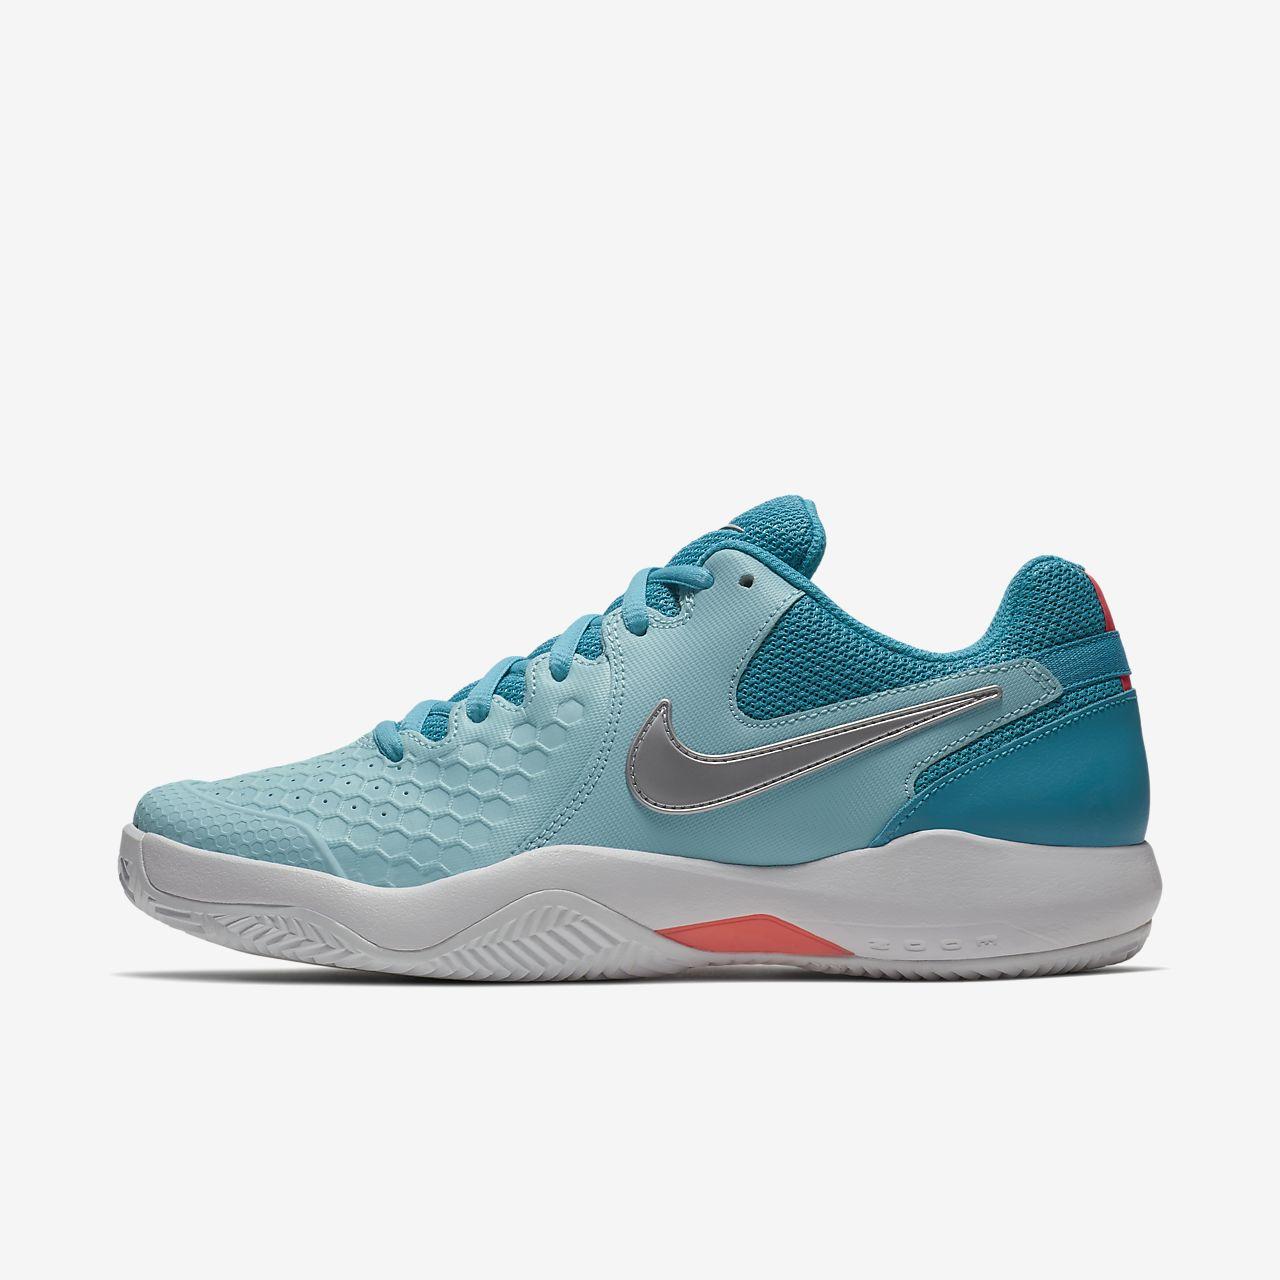 Nikecourt Air Zoom Resistance Hc Women S Tennis Shoe Nike